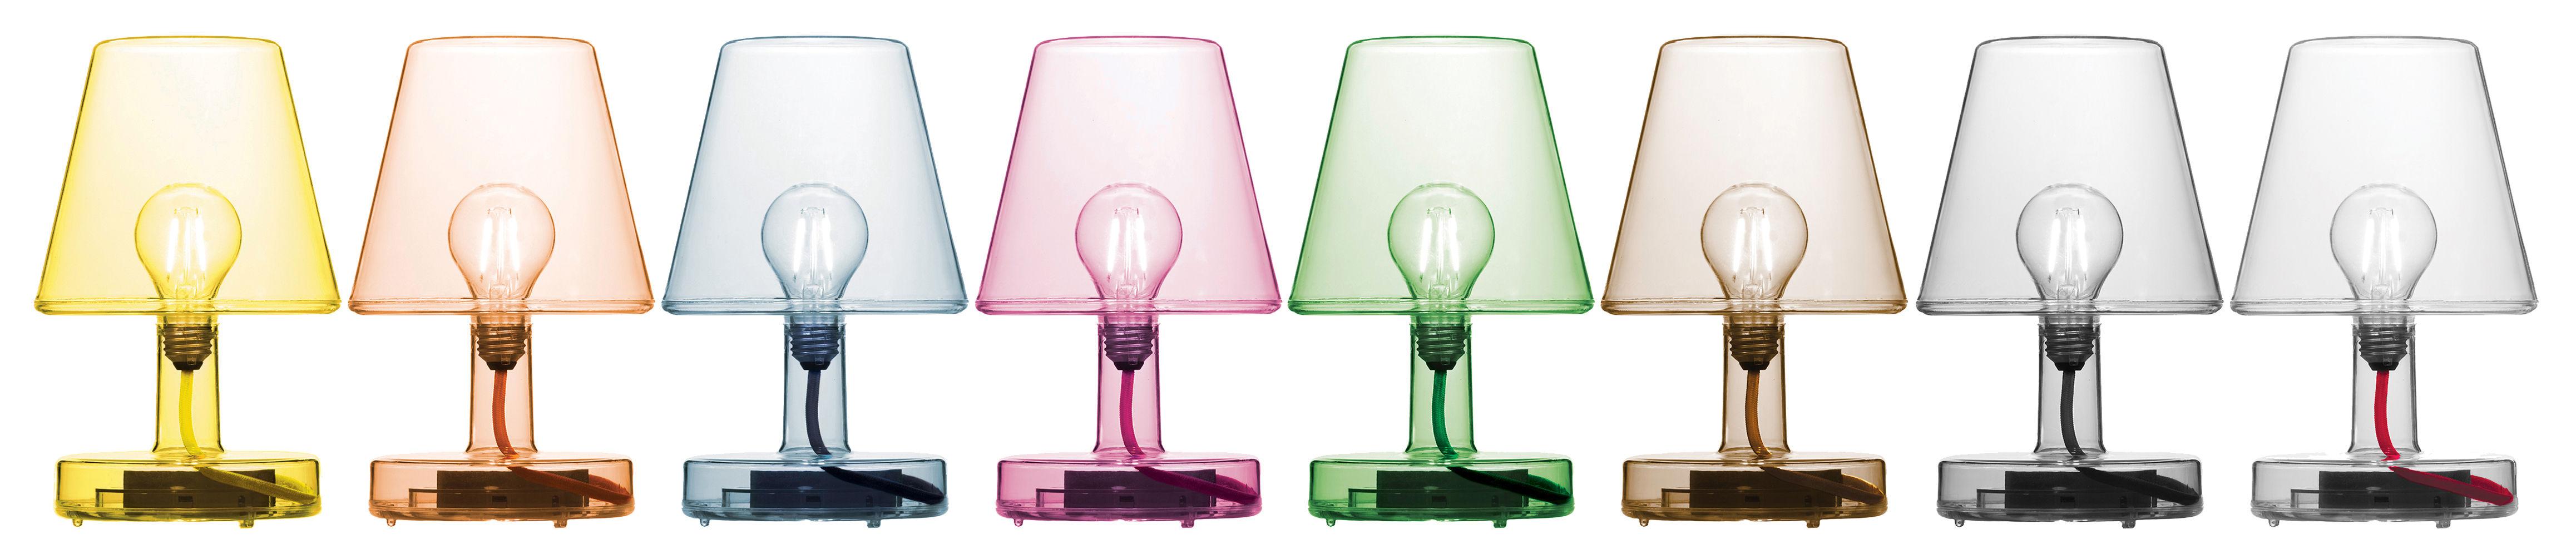 Ø Transloetje H 16 Cm Fatboy Fil X 25 Lampe Led Sans EDH9YeW2I